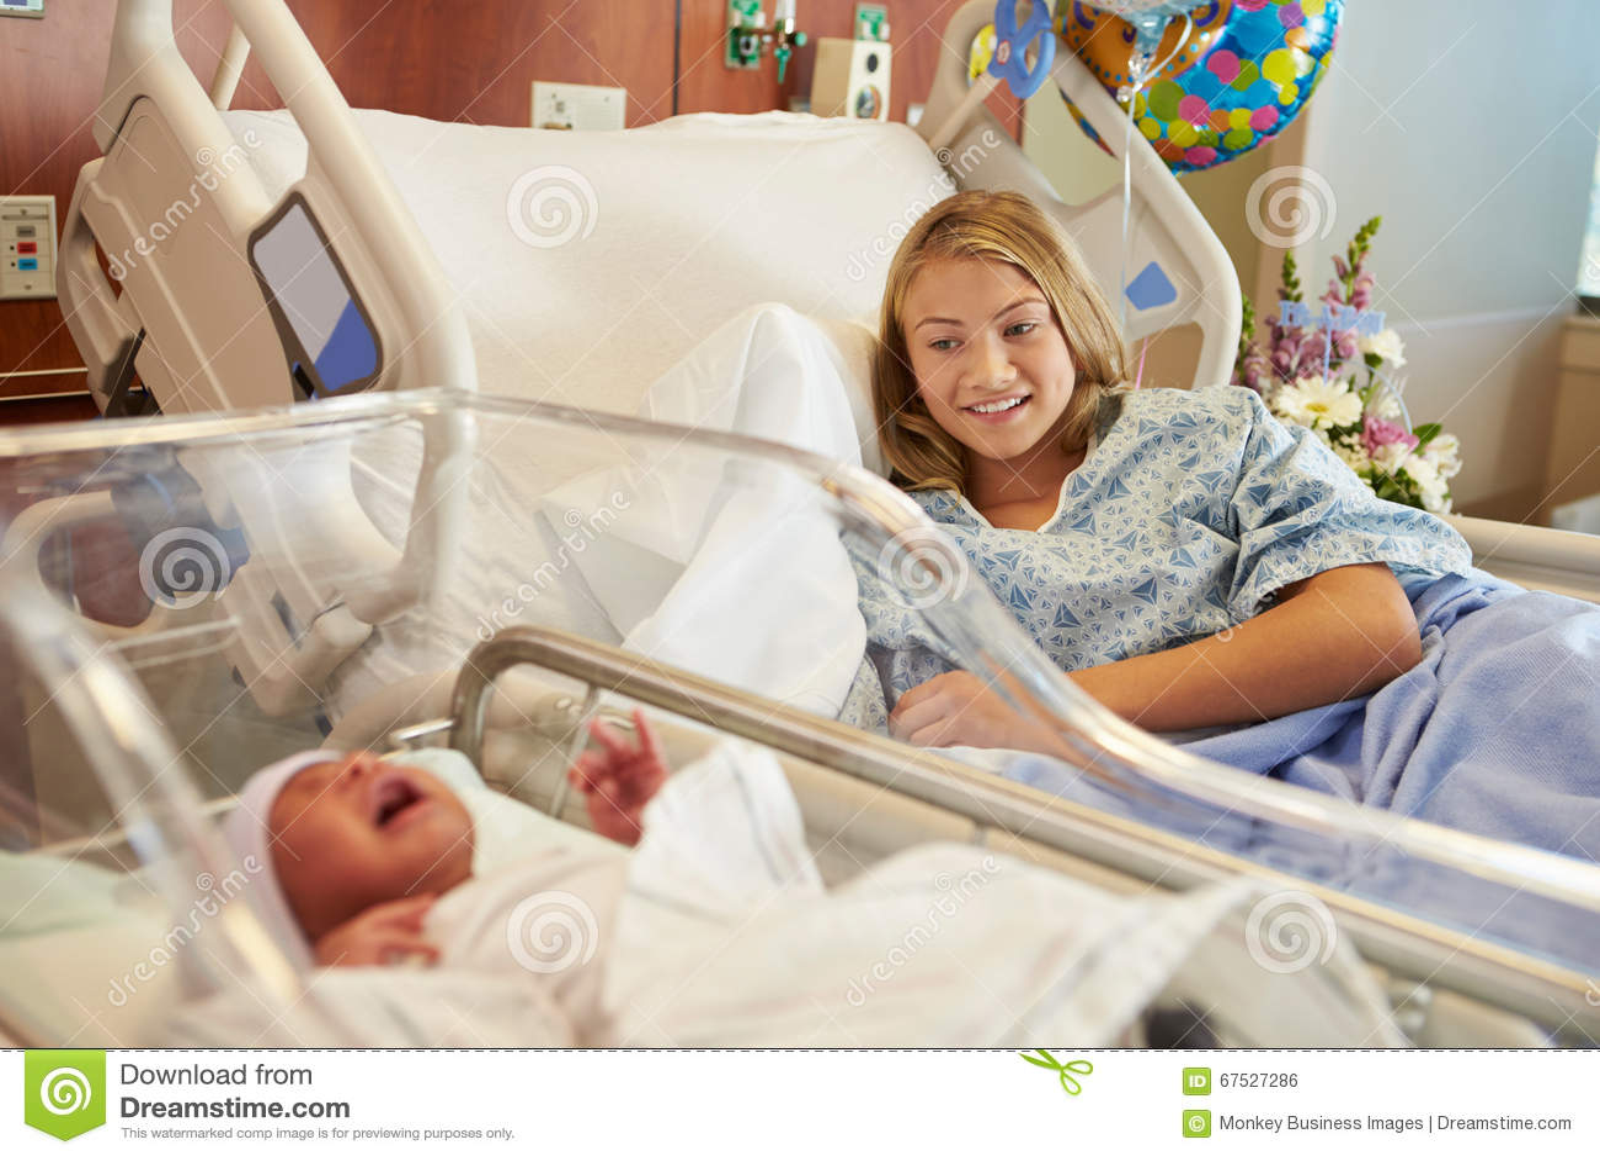 Teenage Girl With Newborn Baby Son In Hospital